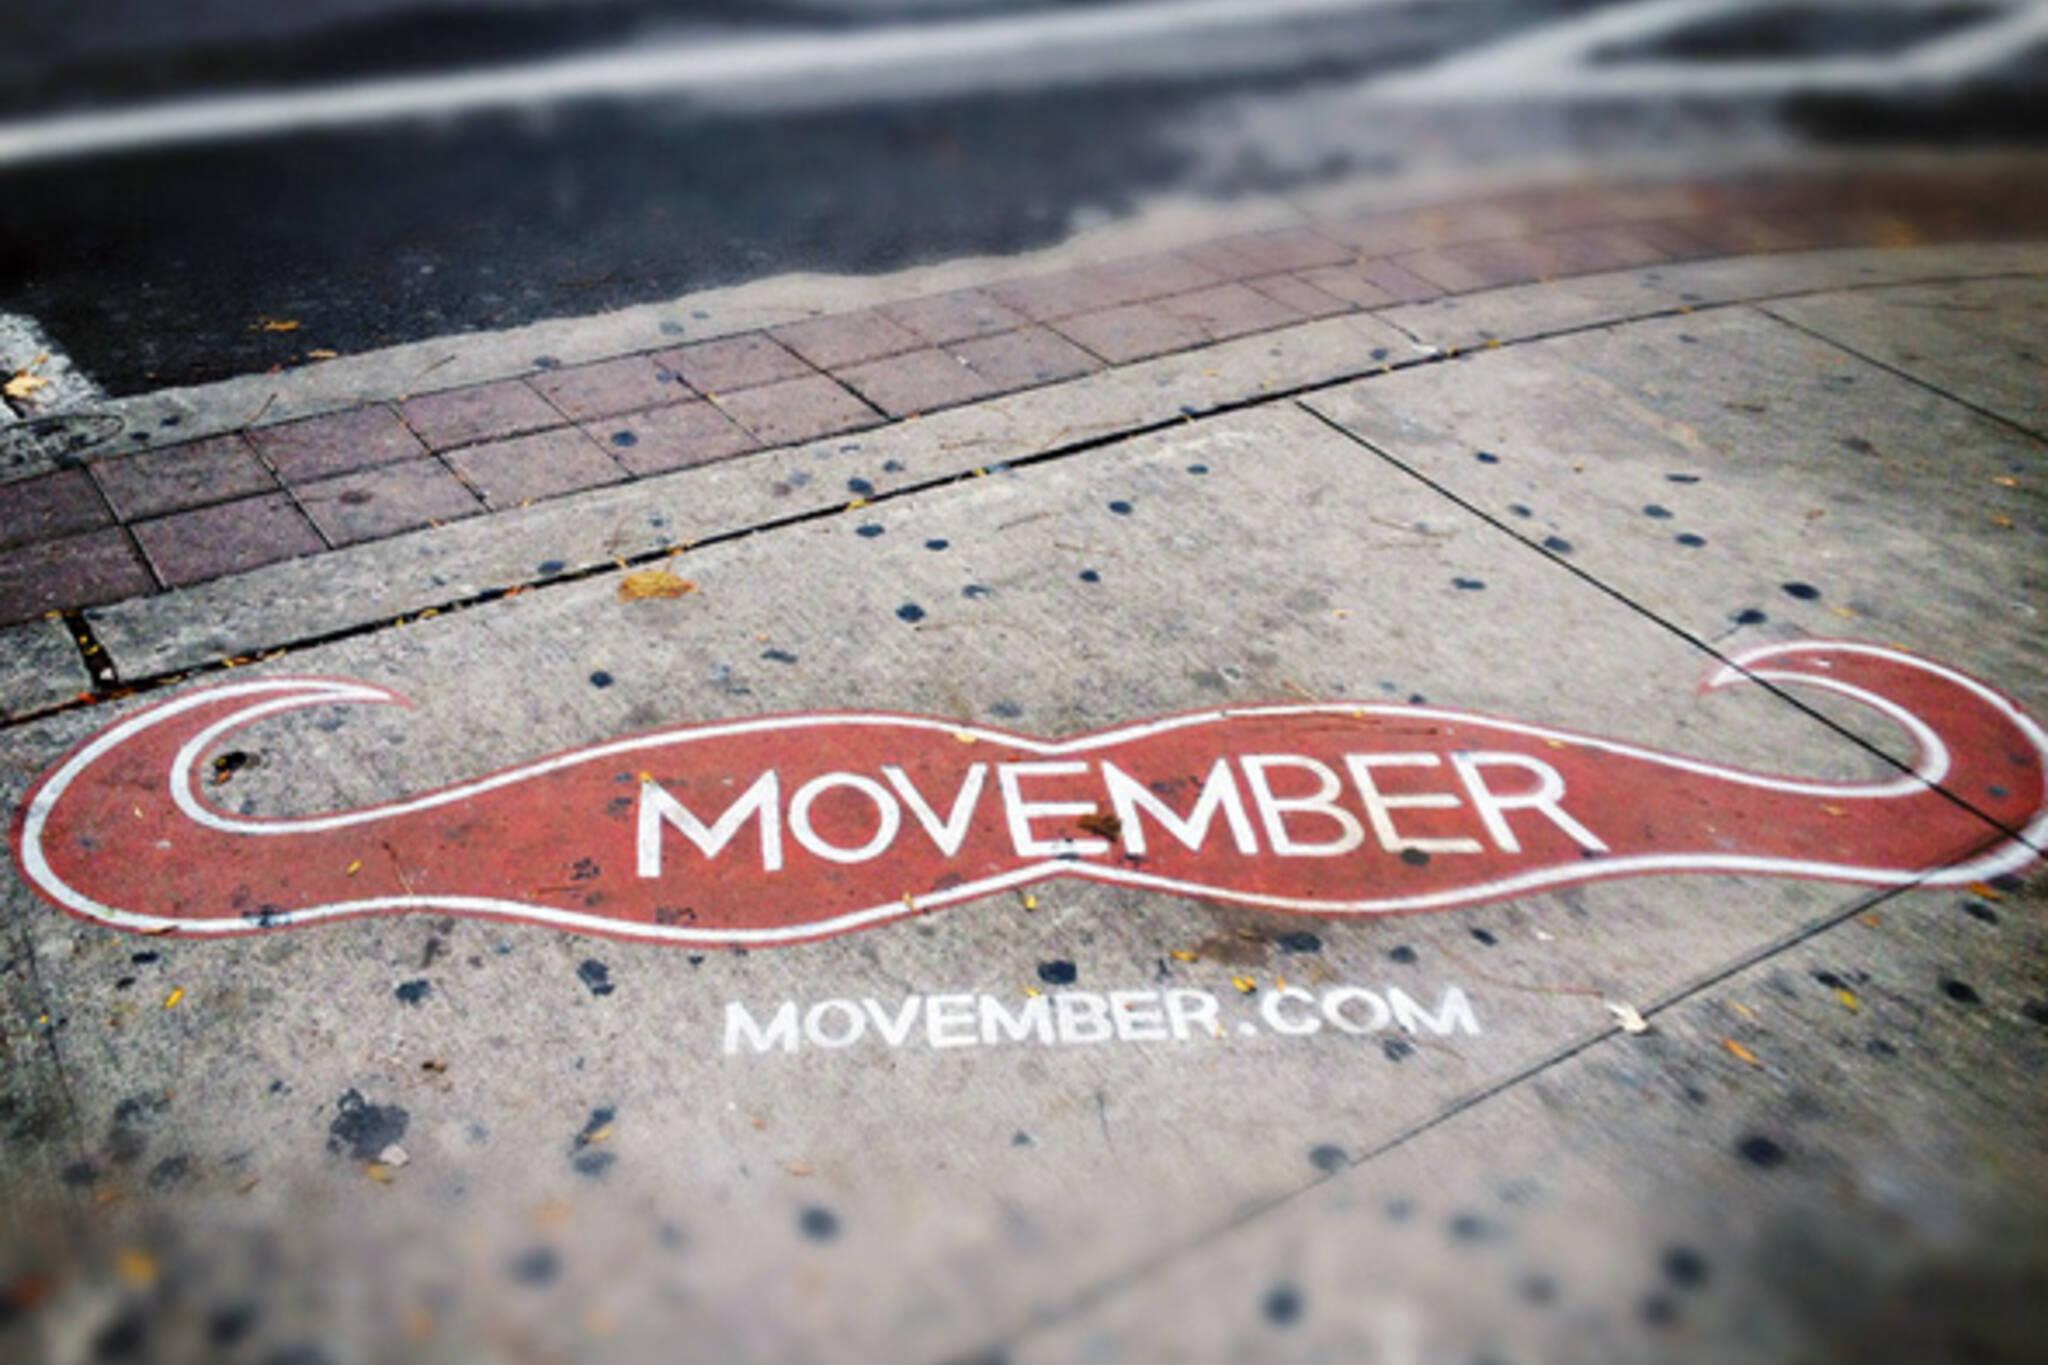 Movember barbershop Toronto